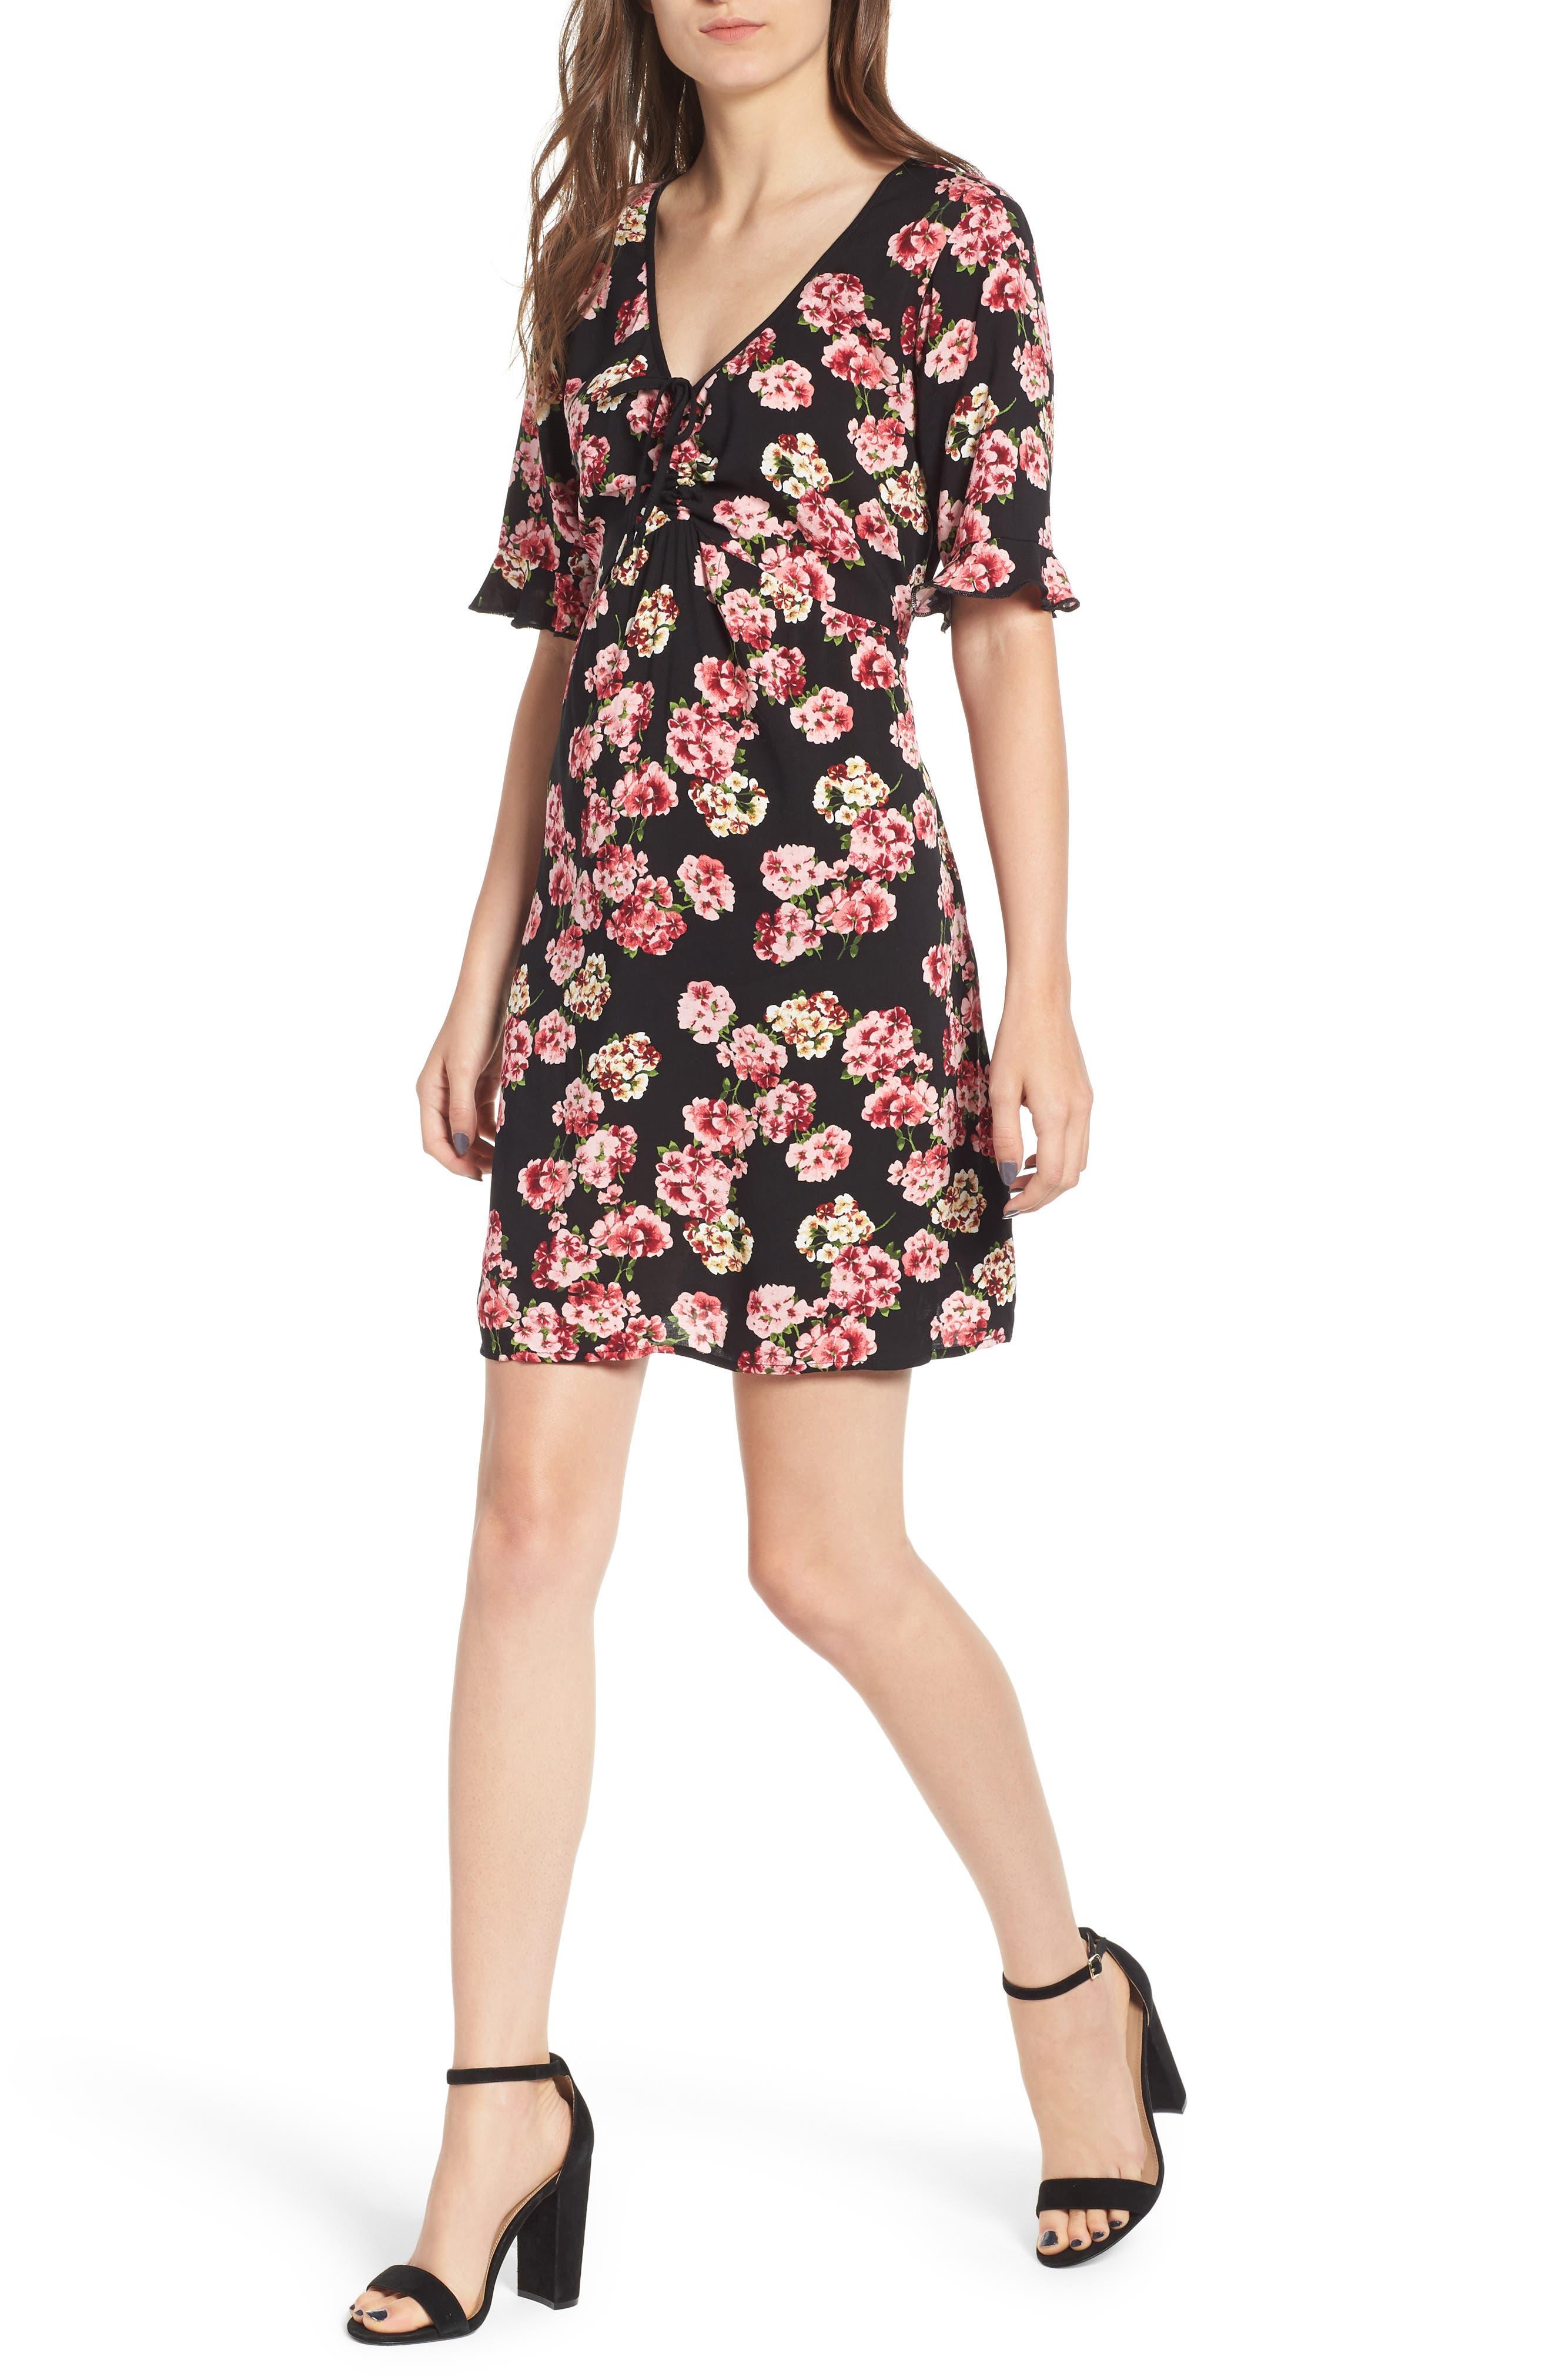 BAND OF GYPSIES Floral Print Tie Ruched Dress in Black/ Pink